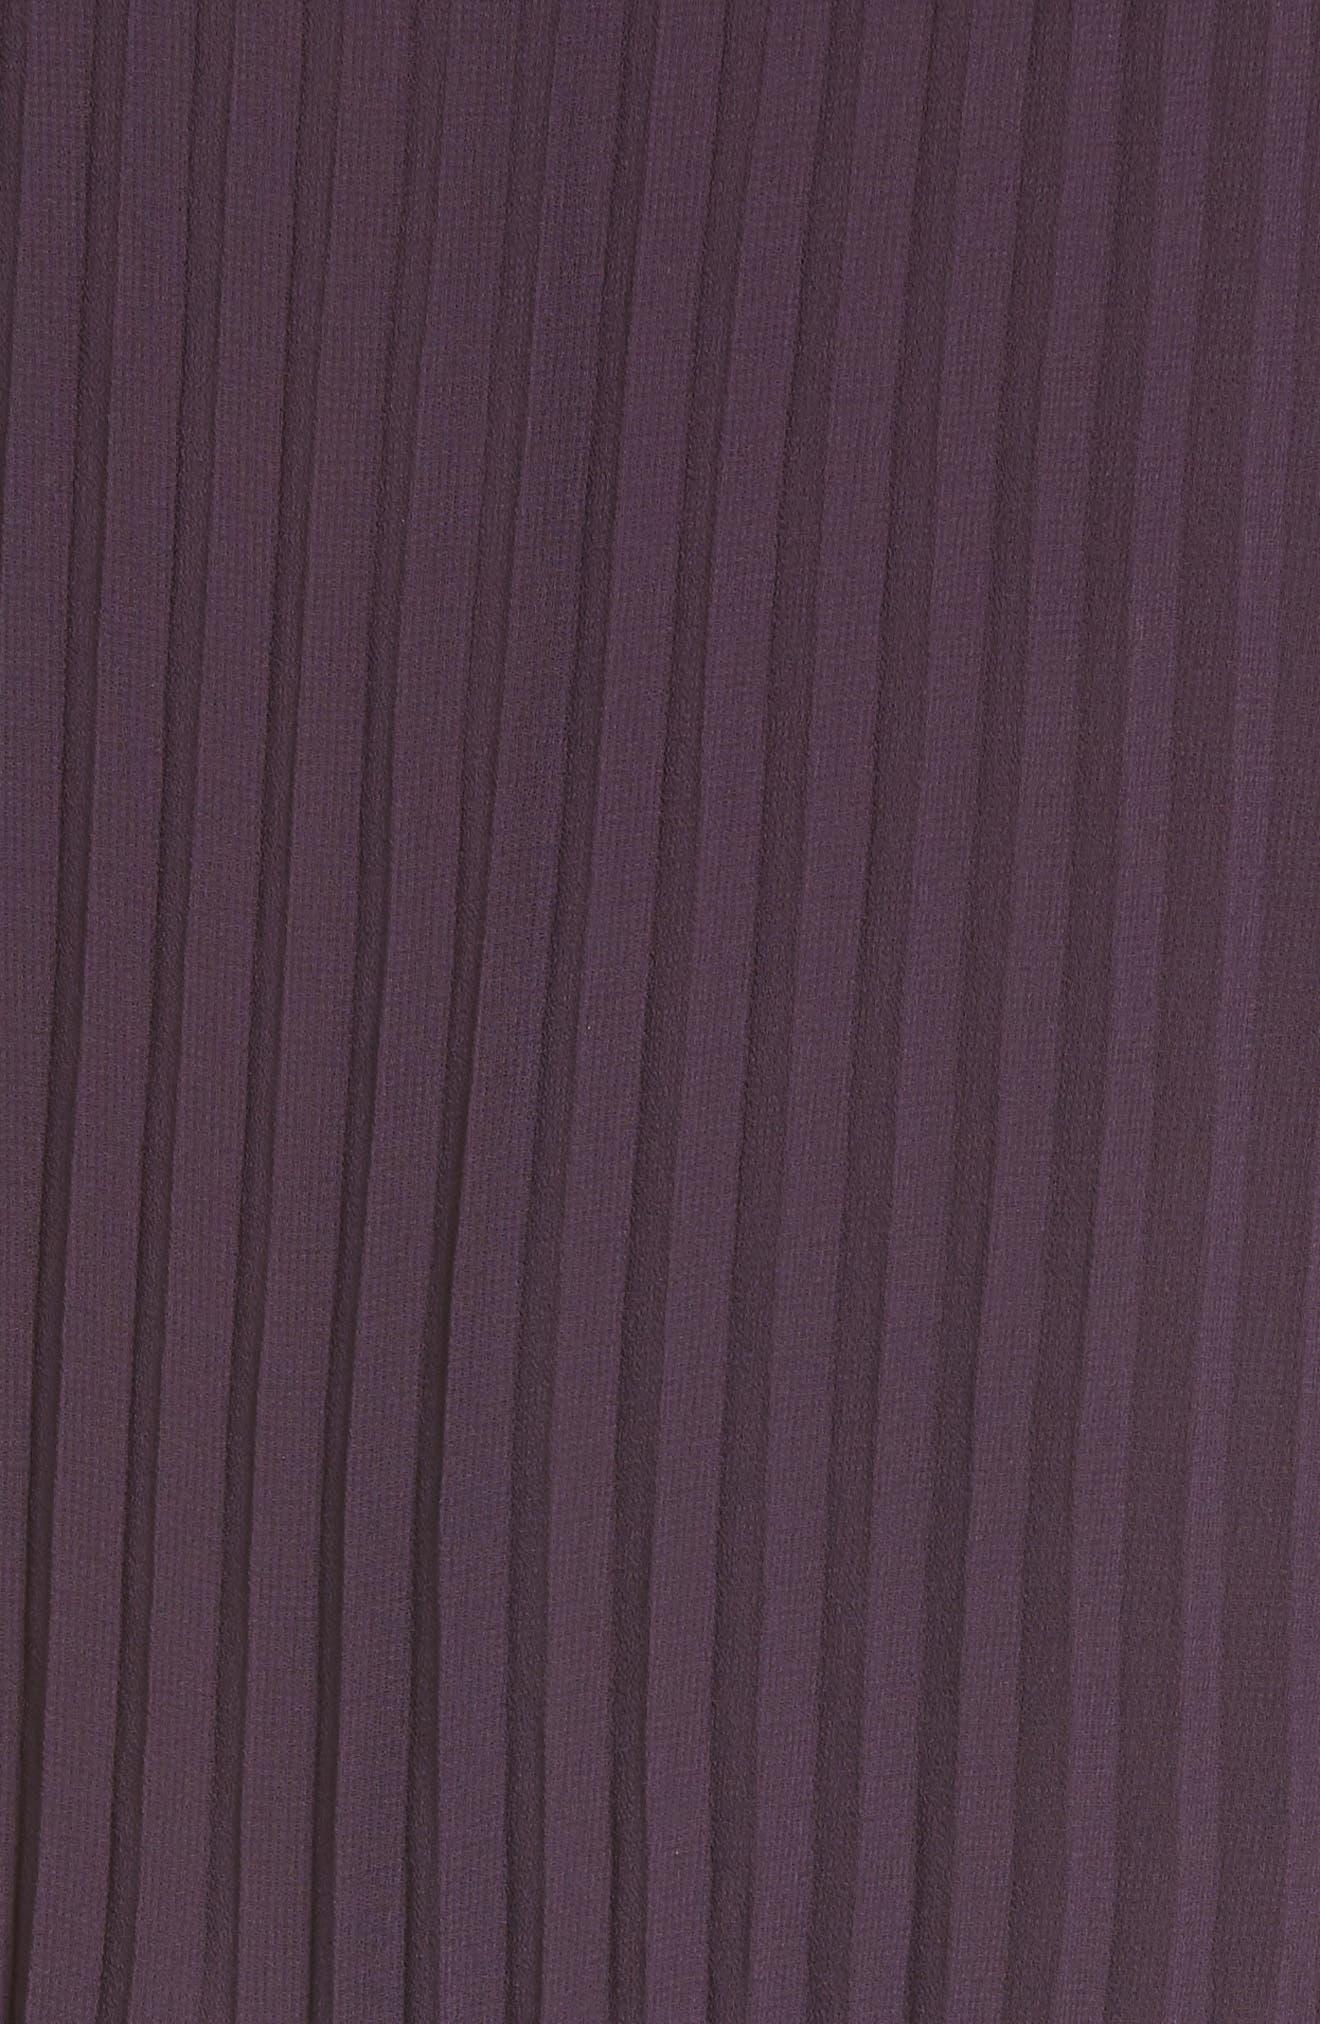 Chiffon Maxi Dress,                             Alternate thumbnail 14, color,